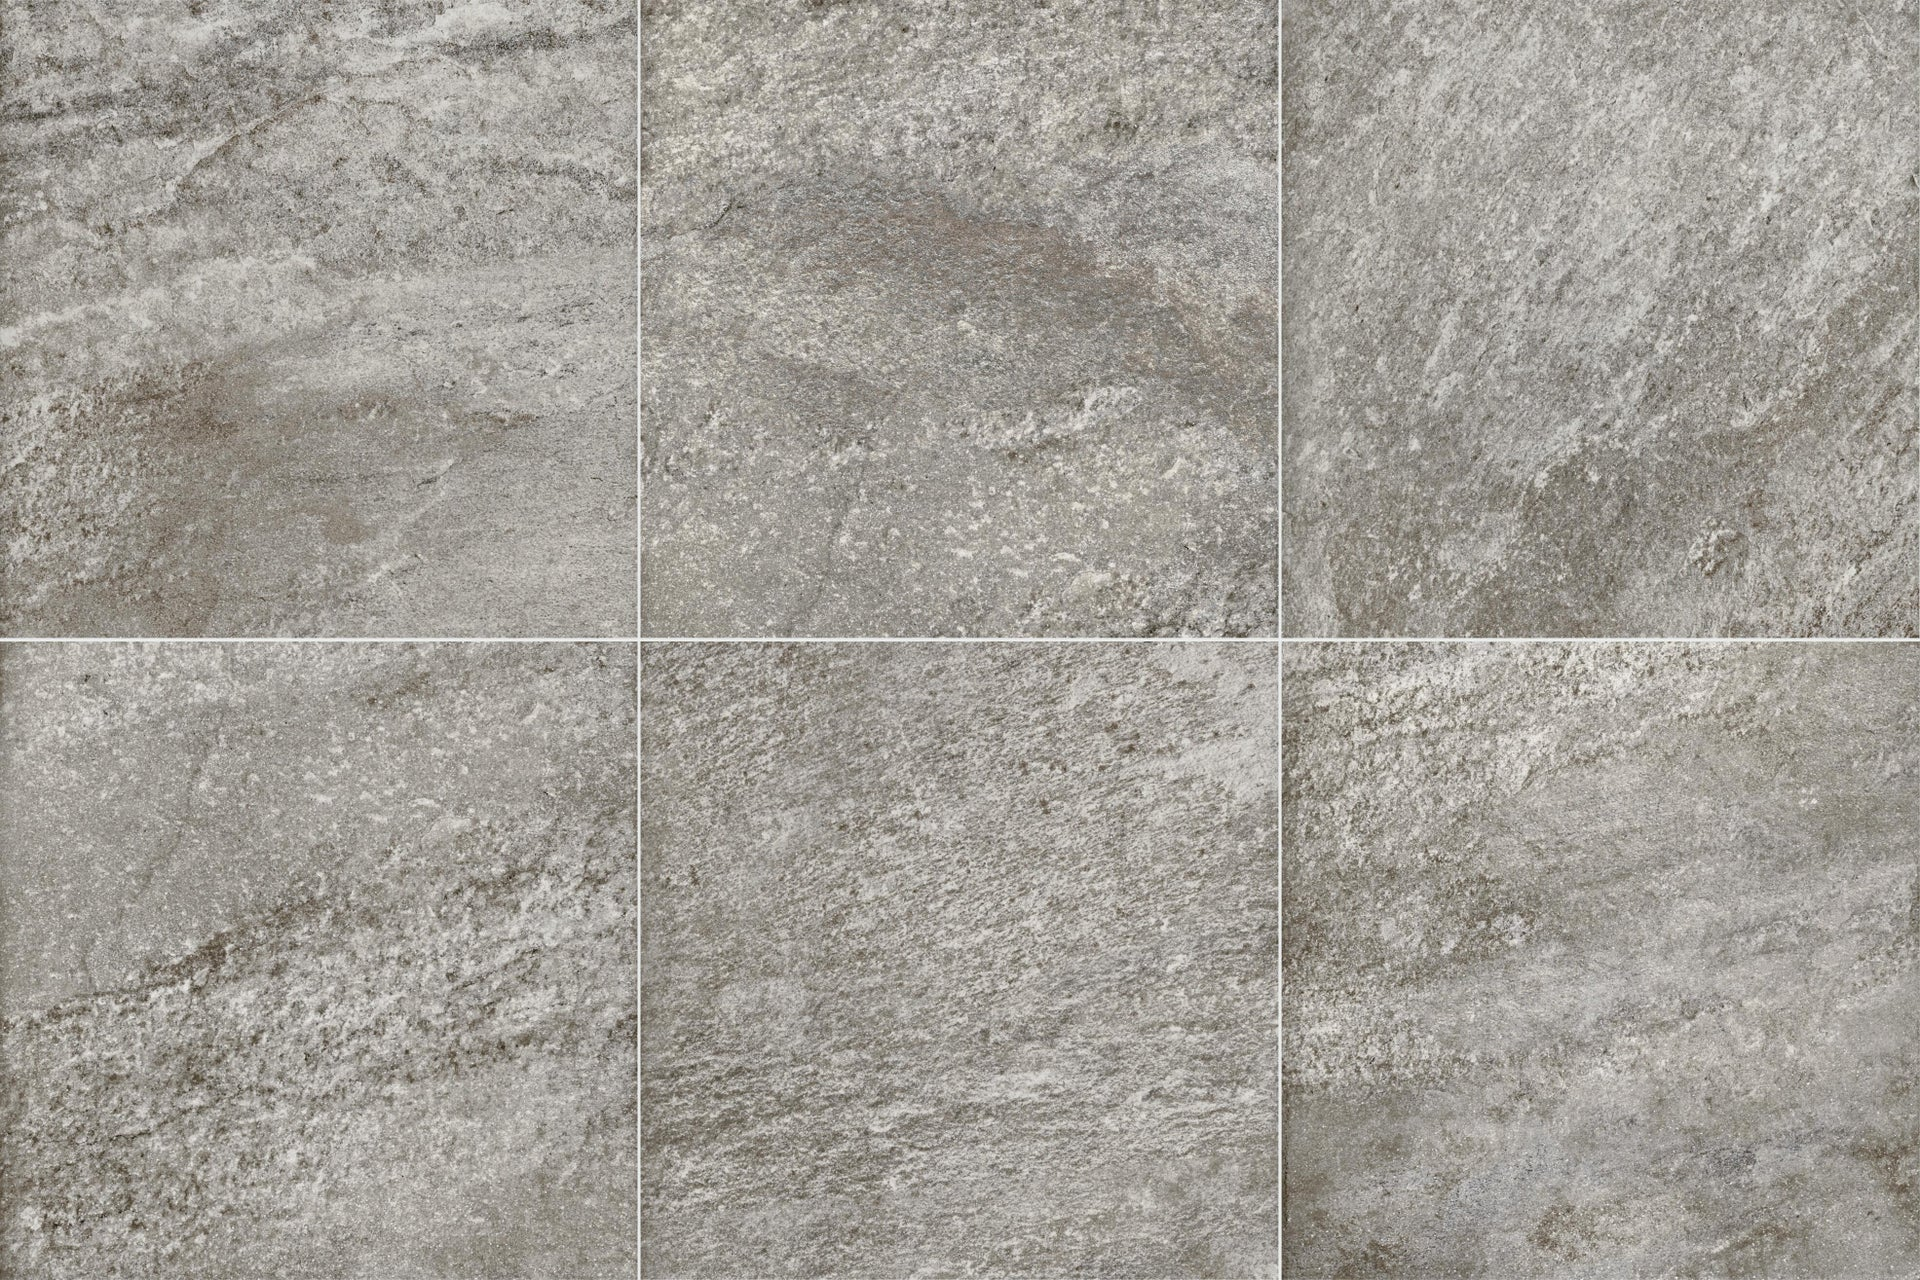 Piastrella da pavimento Walk 32.5 x 32.5 cm sp. 9 mm PEI 3/5 grigio - 9